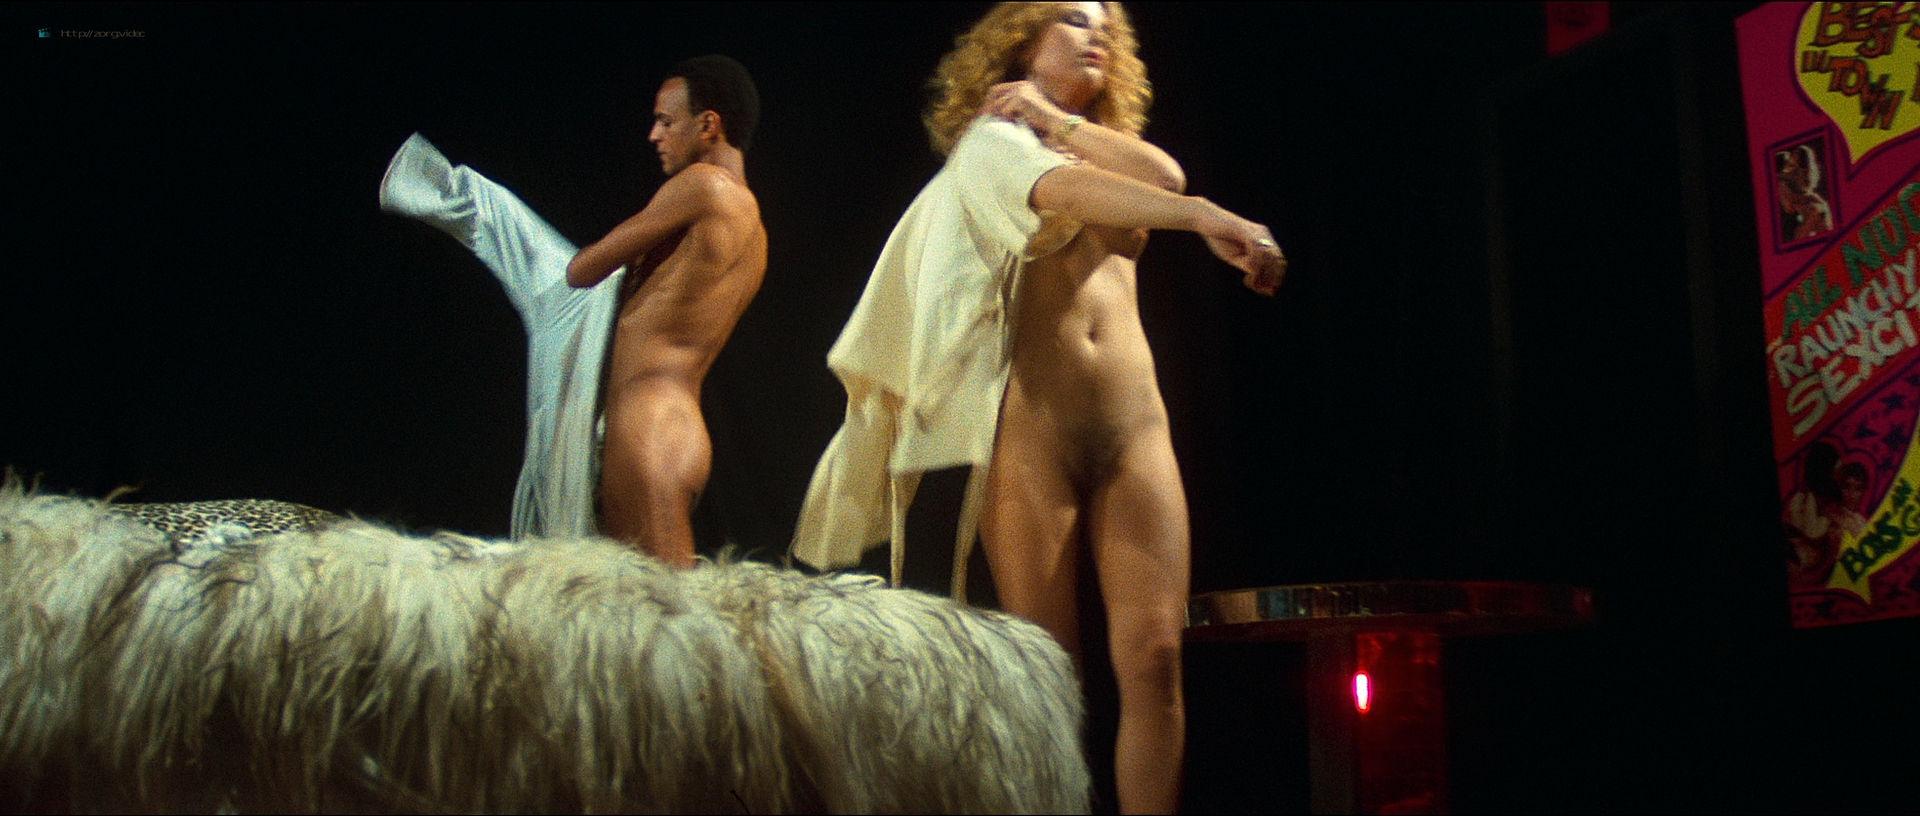 Daniela Doria nude full frontal Zora Kerova and other nude - The New York Ripper (IT-1982) HD 1080p BluRay(r) (11)